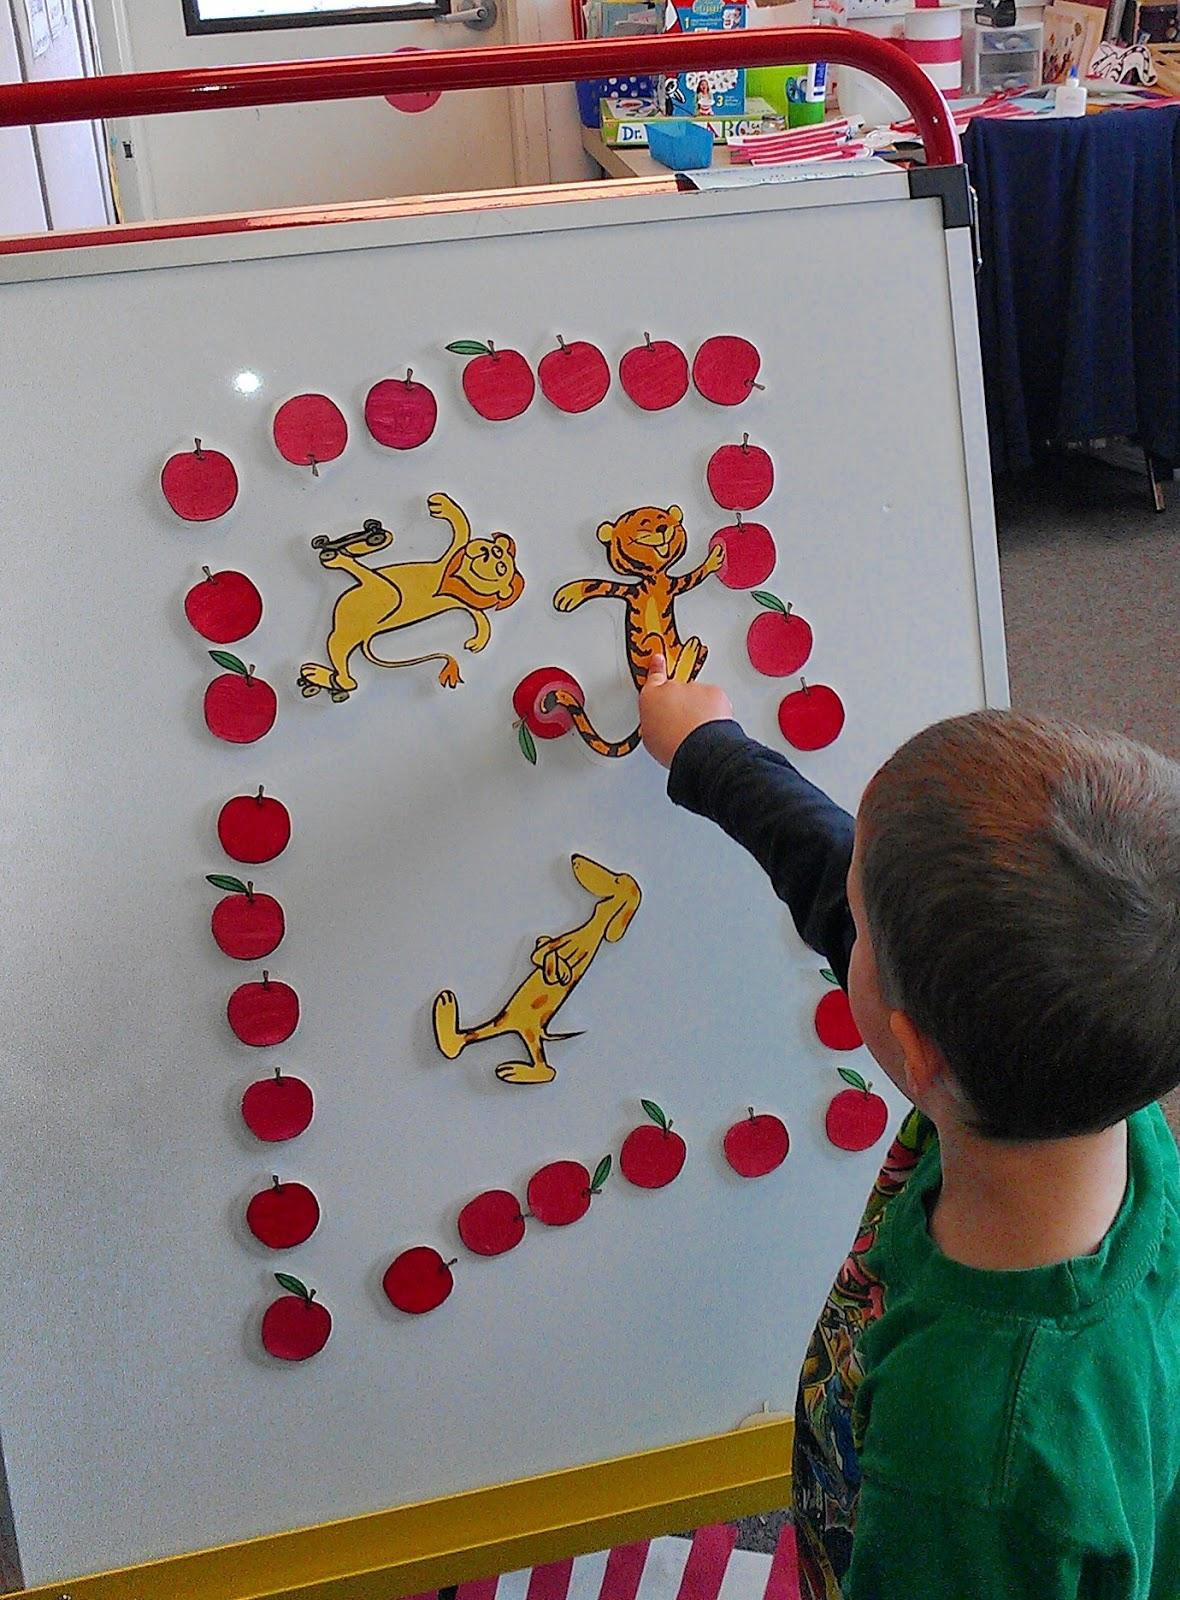 The Preschool Experiment Dr Seuss 10 Apples Up On Top